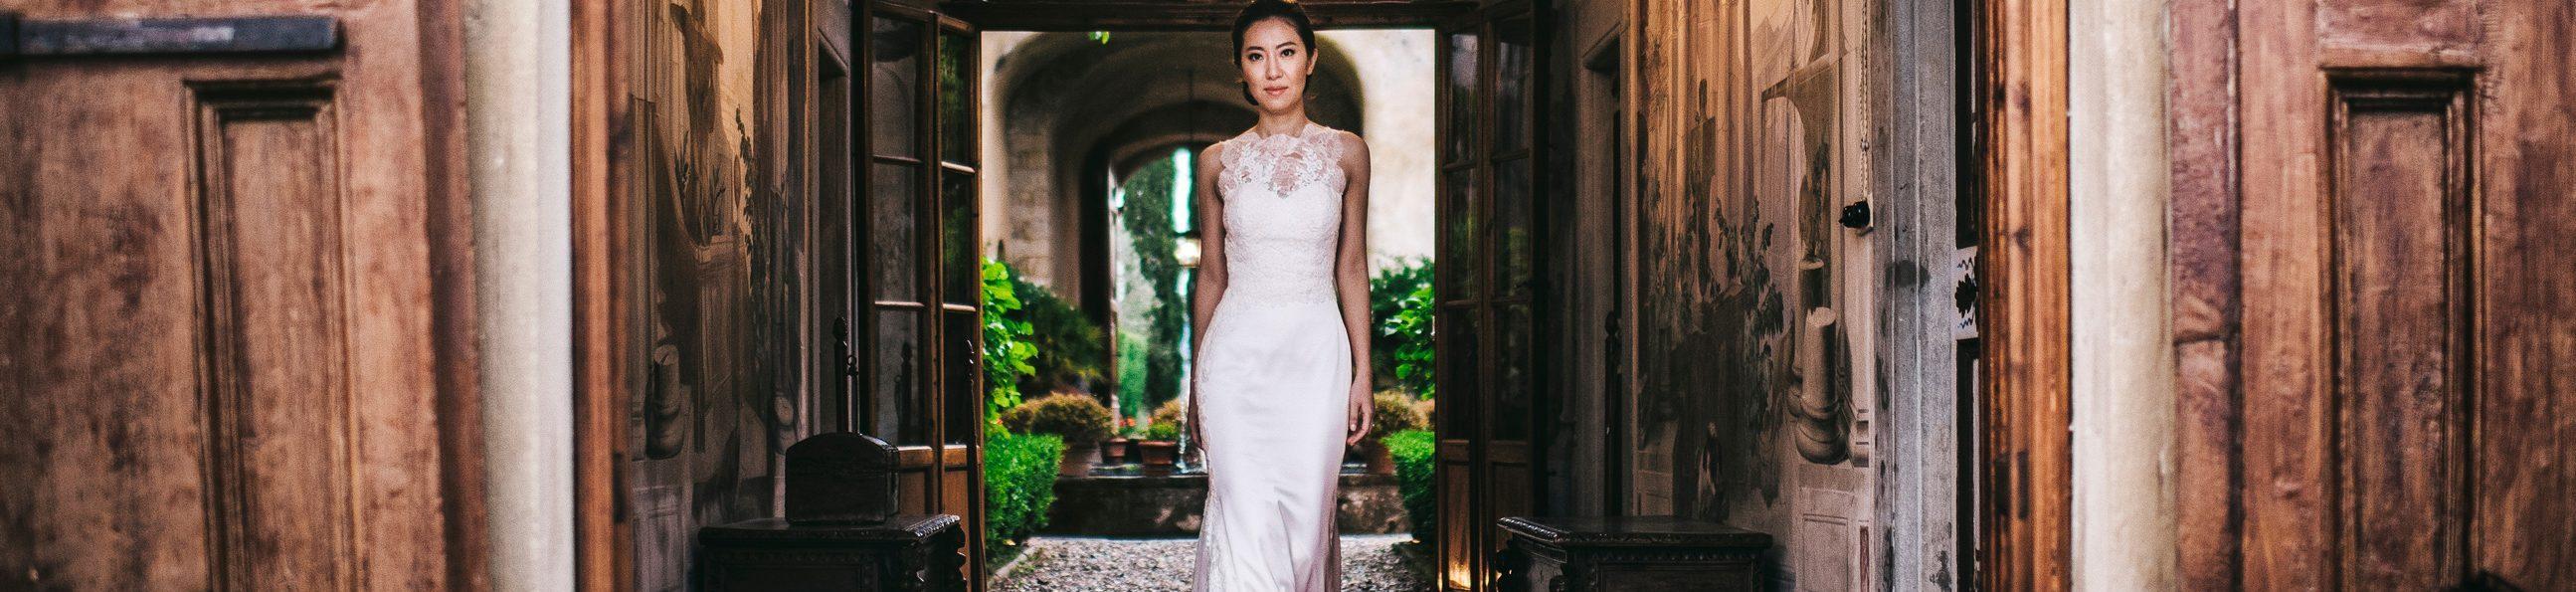 wedding photographer in tuscany italy florence